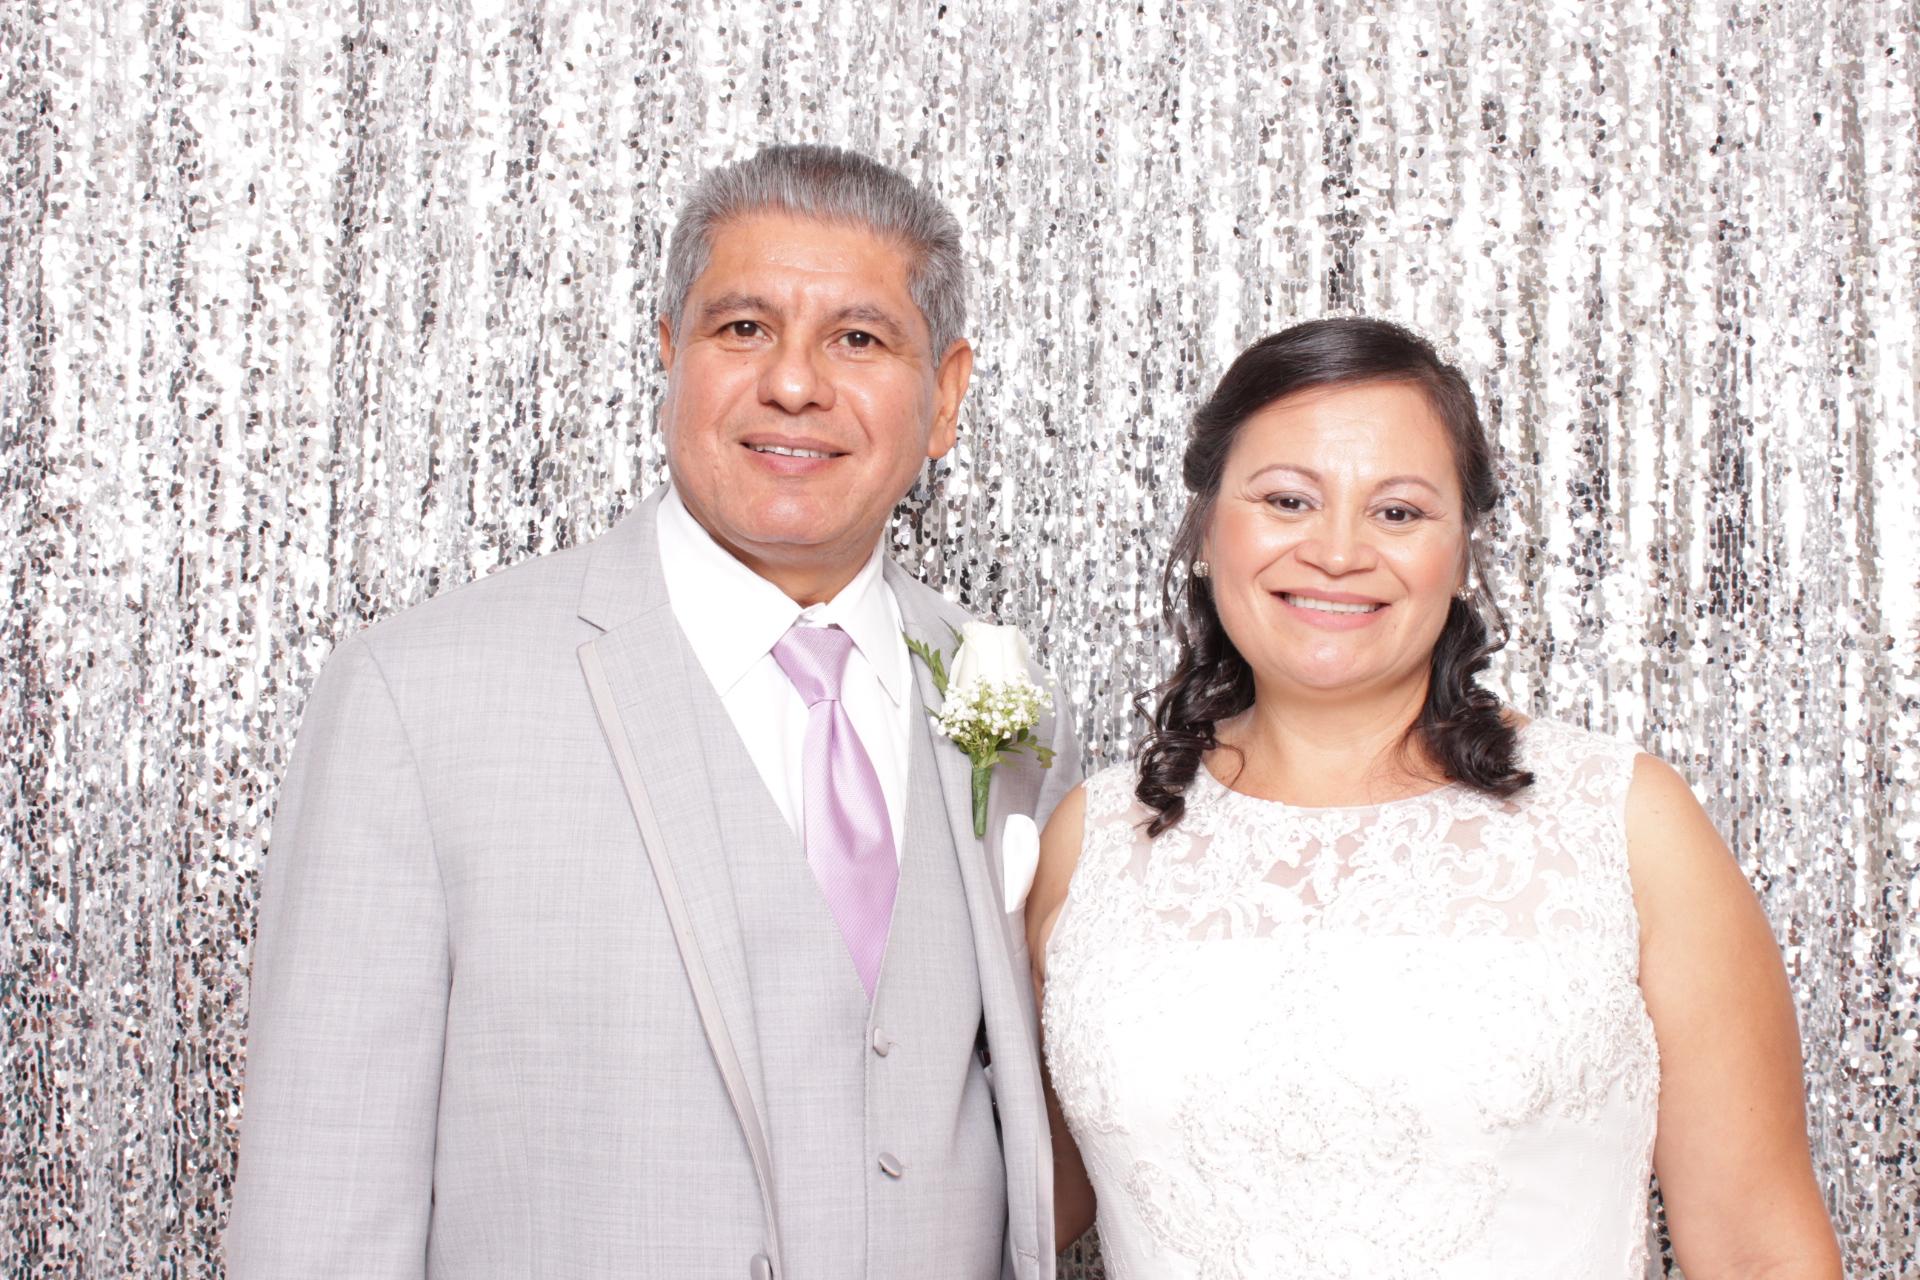 GLORIA + SERGIO 25TH WEDDING ANNIVERSARY